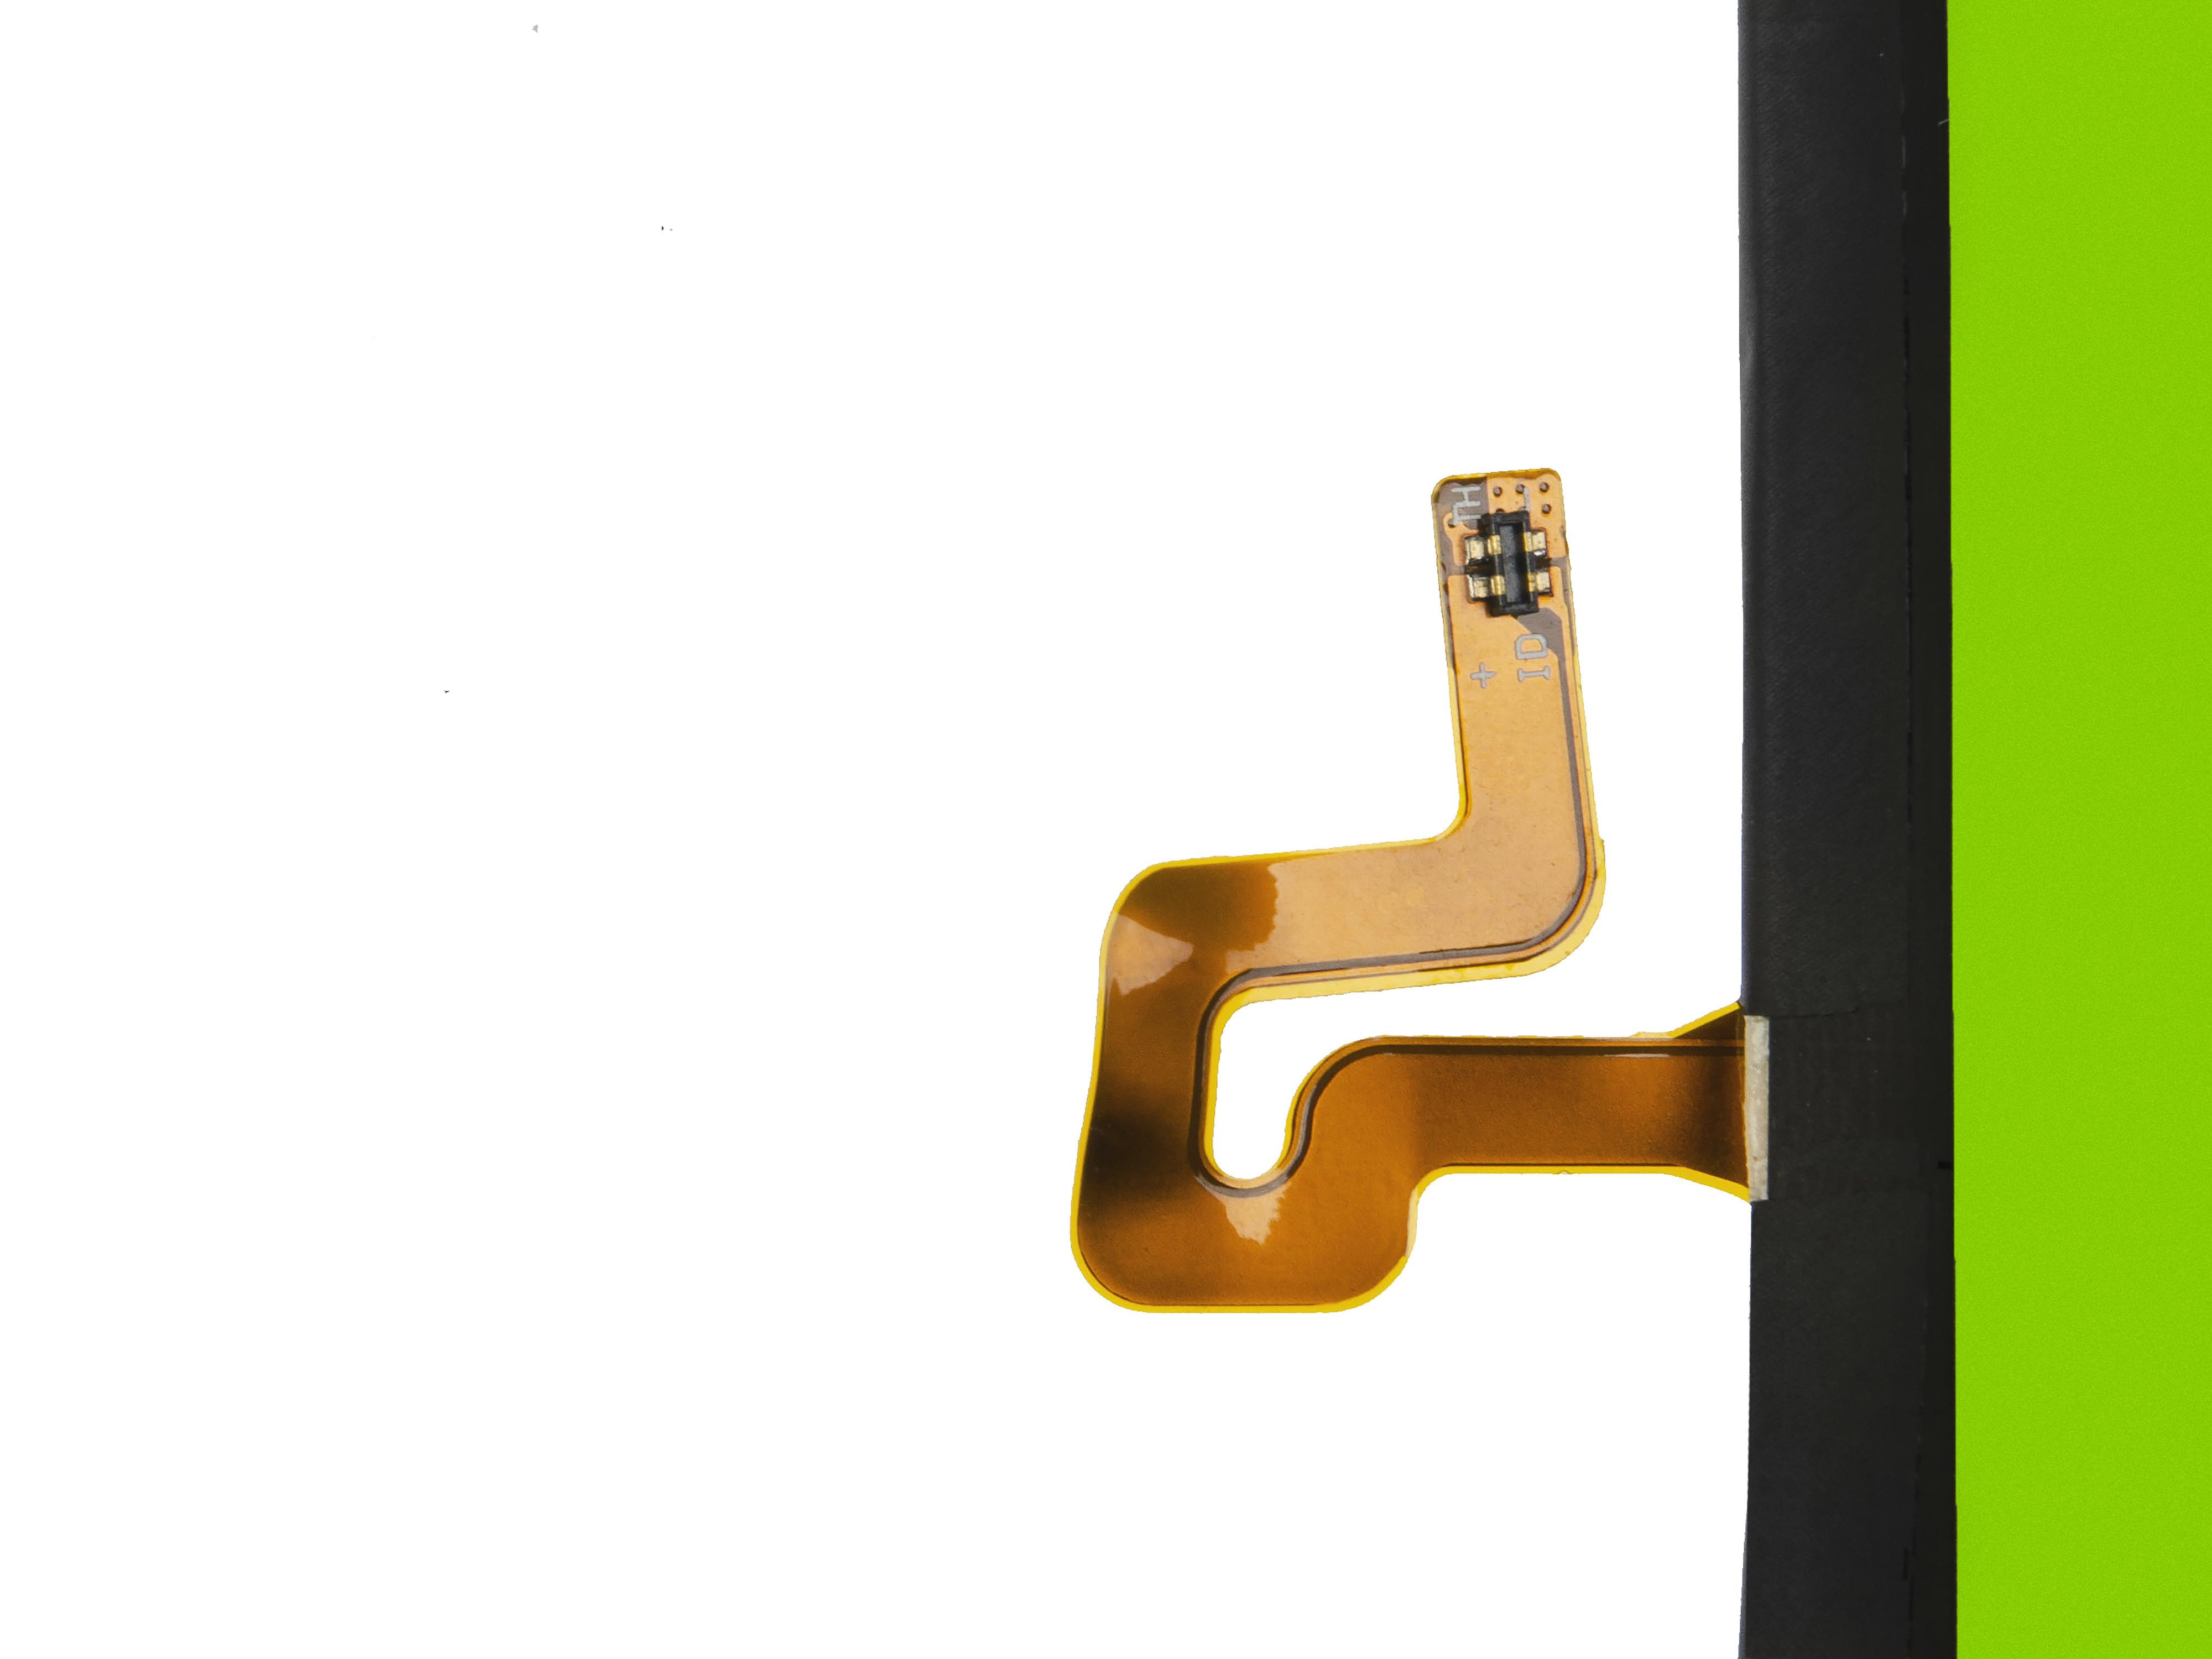 Green Cell BP119 Baterie Google BL-T35, Google Pixel 2 XL 3520mAh Li-Ion – neoriginální